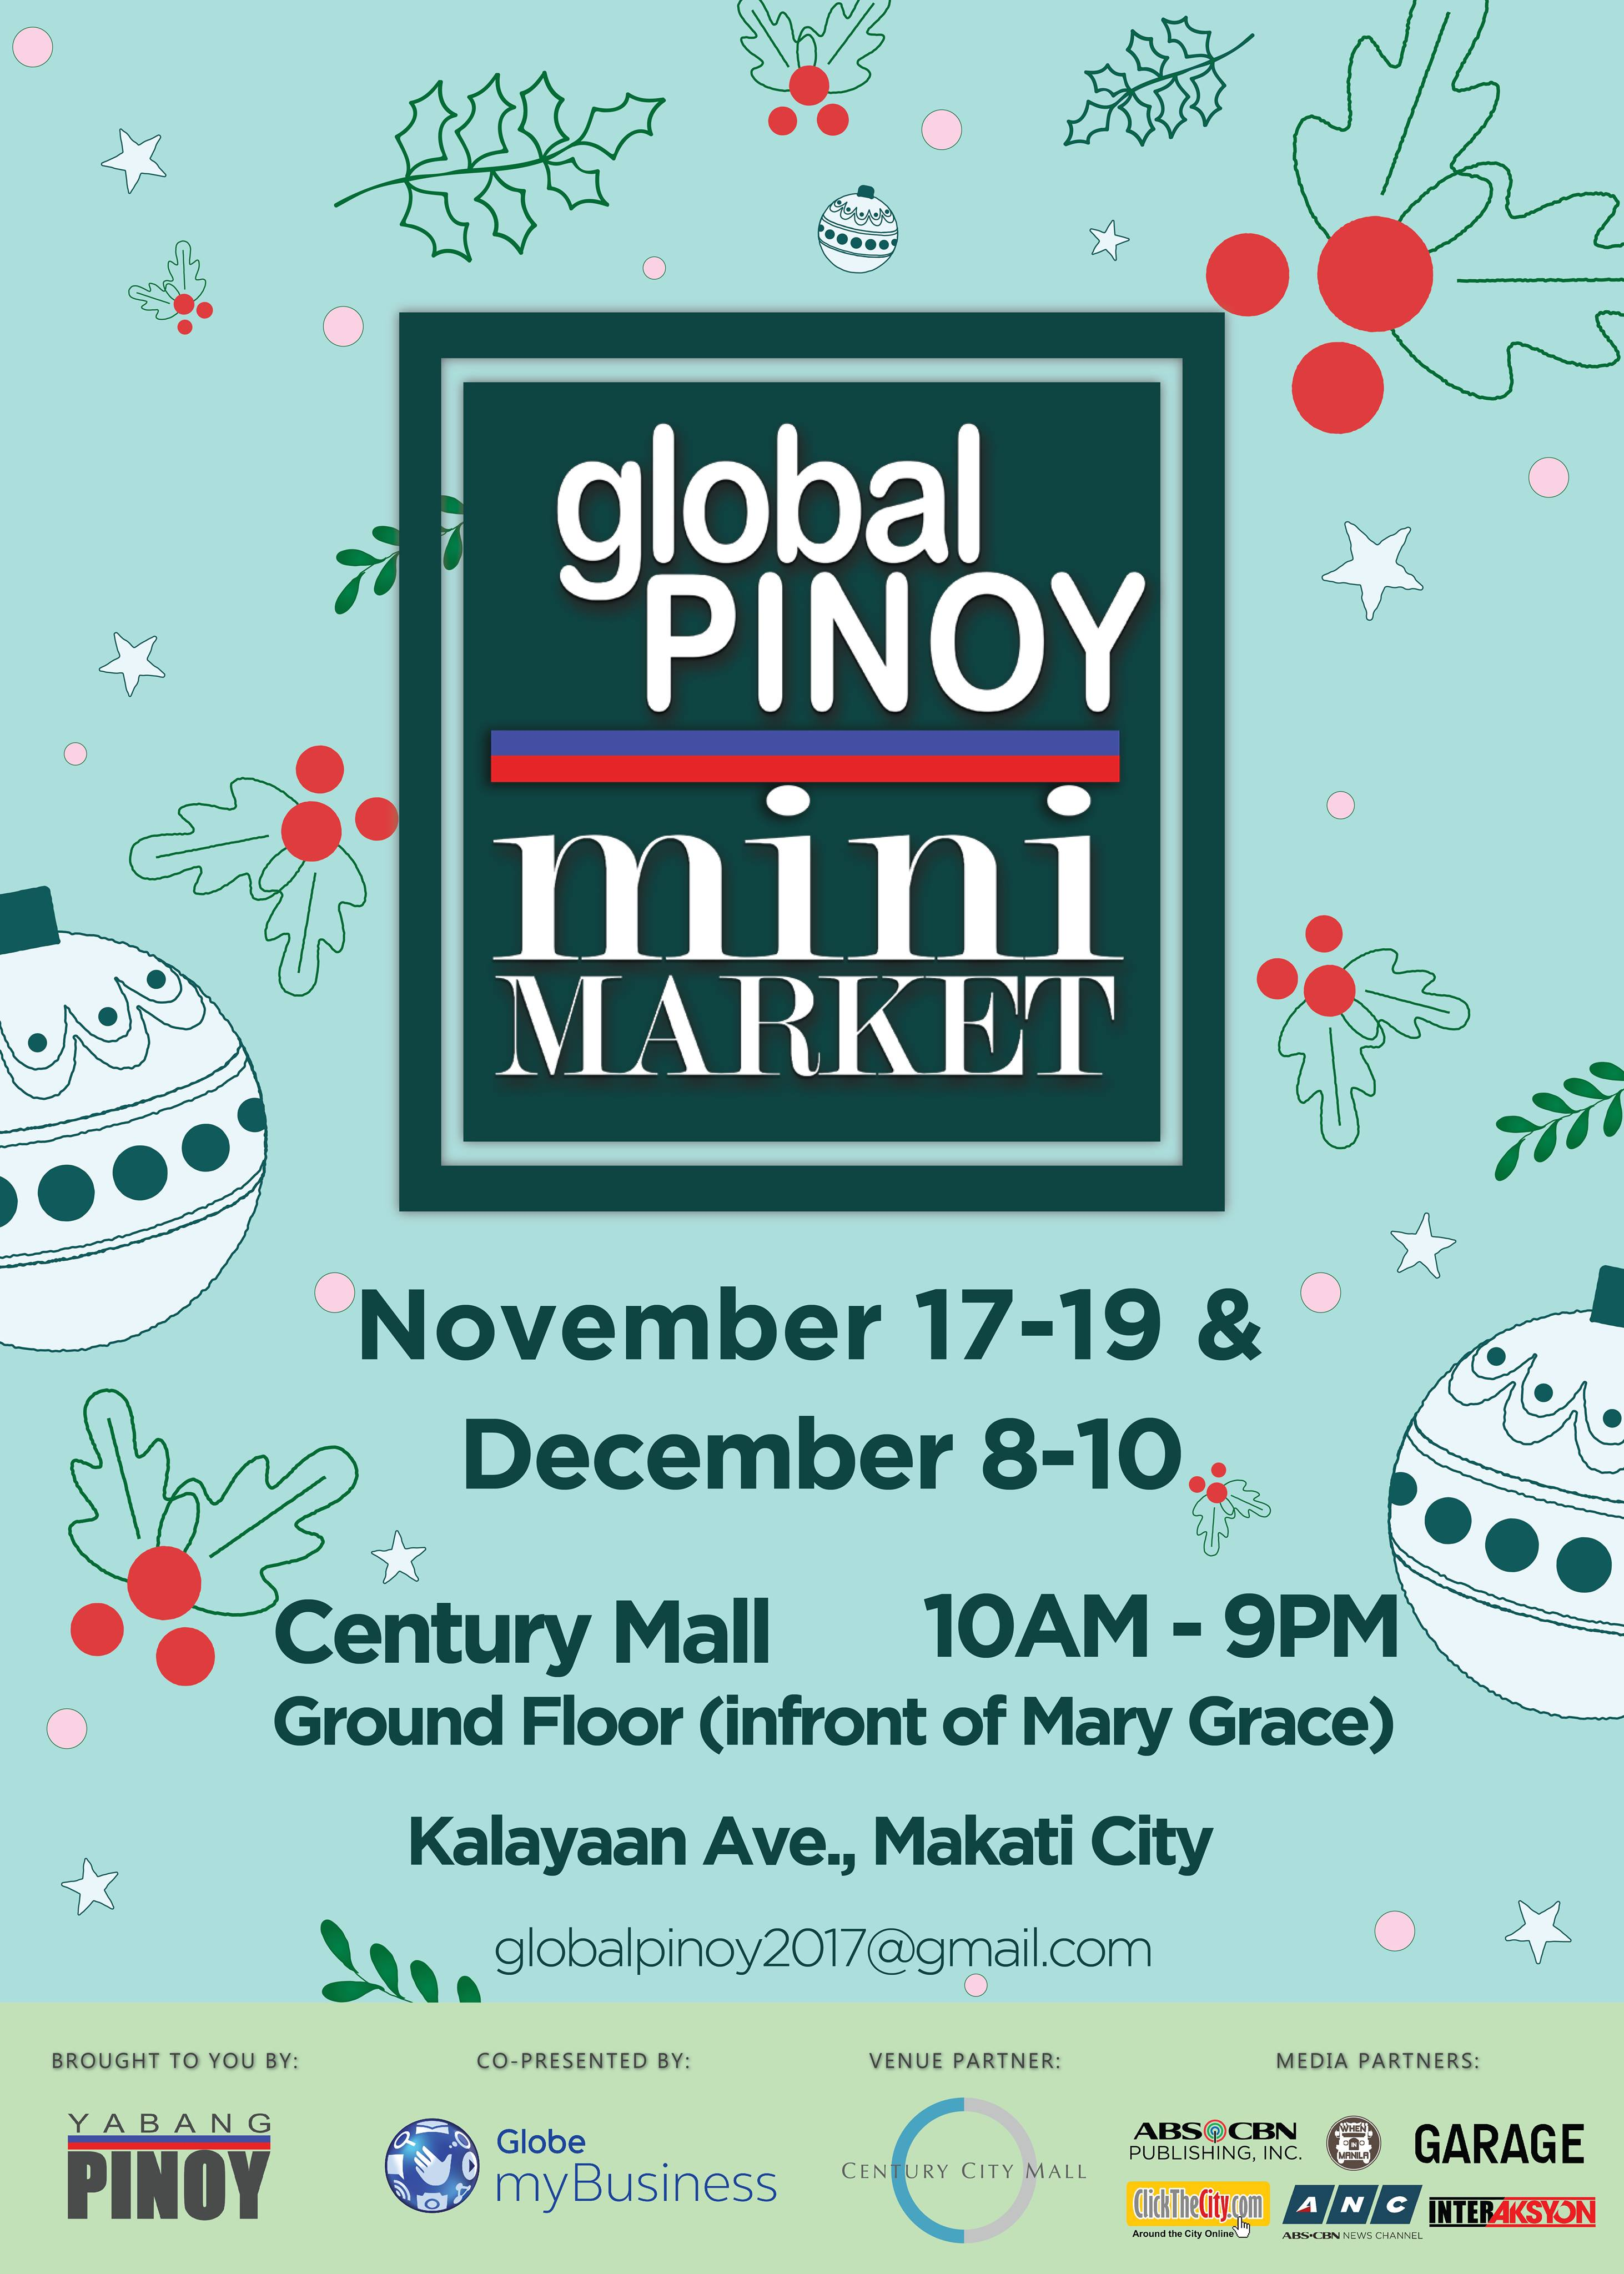 Global Pinoy Mini Market at Century Mall